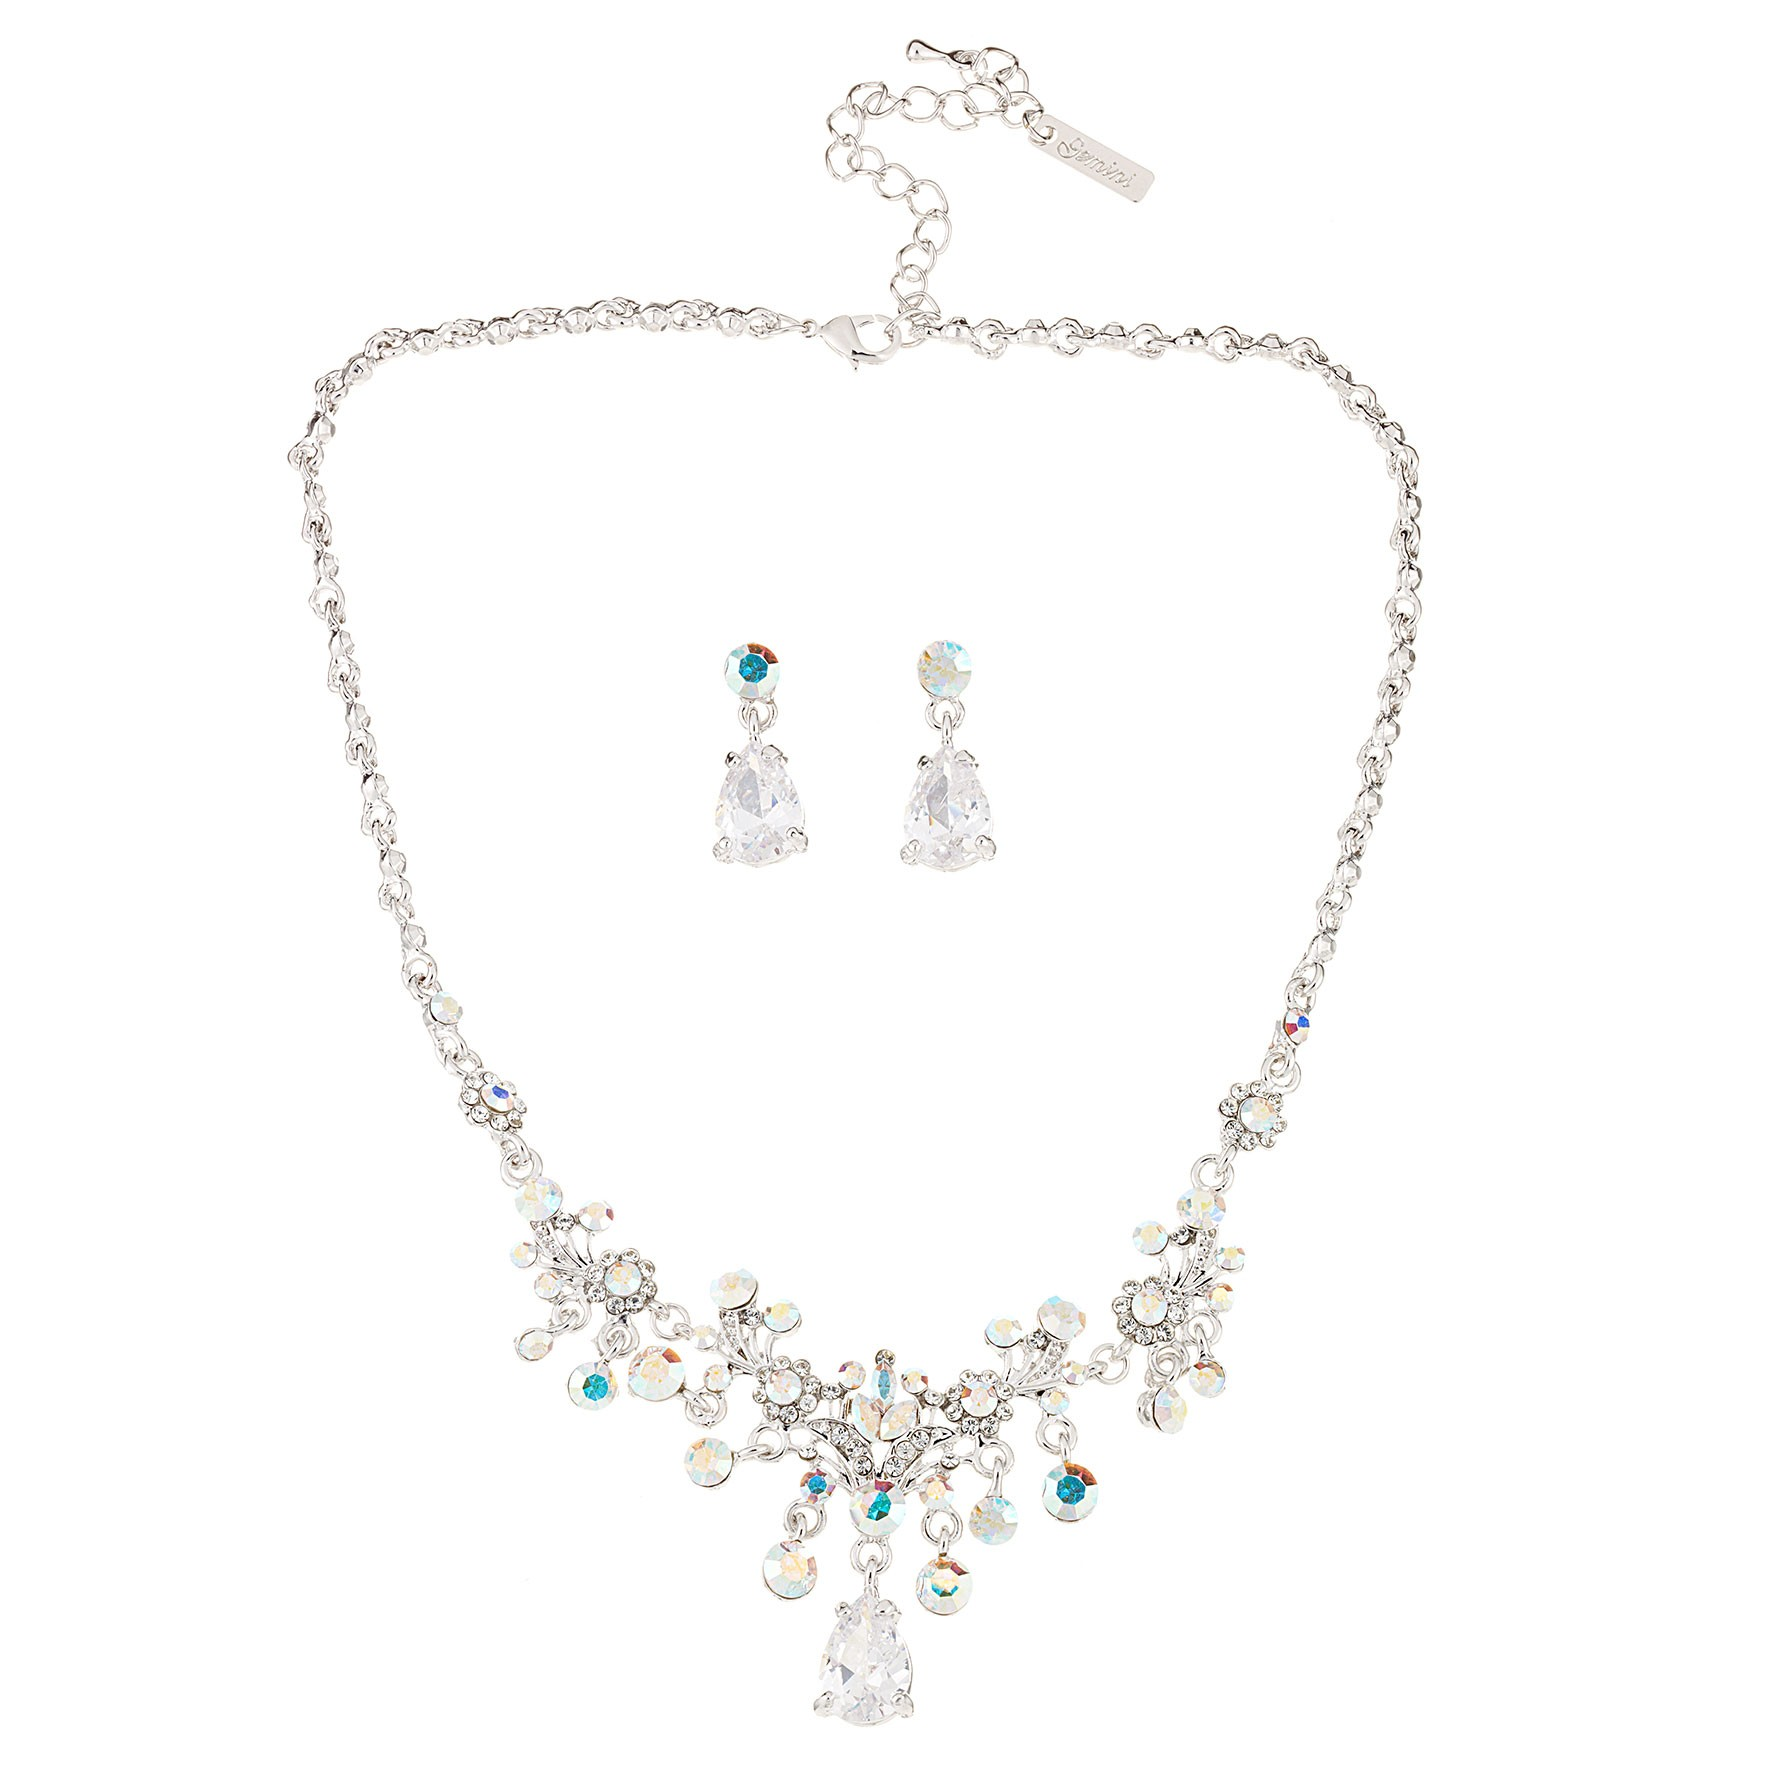 Swarovski Crystal Crystal Drop Necklace Amp Earrings In Ab